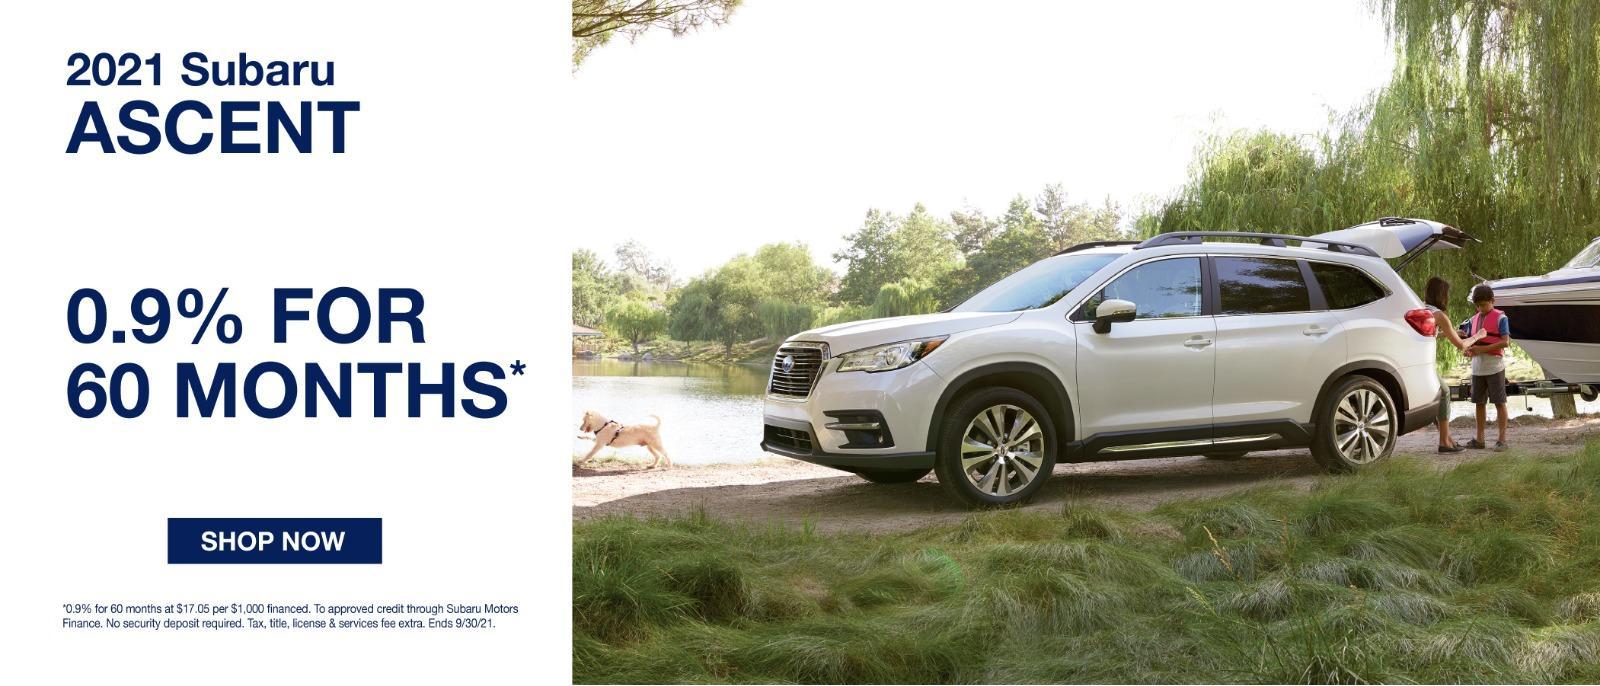 2021 Subaru Ascent 0.9% for 60 Months*